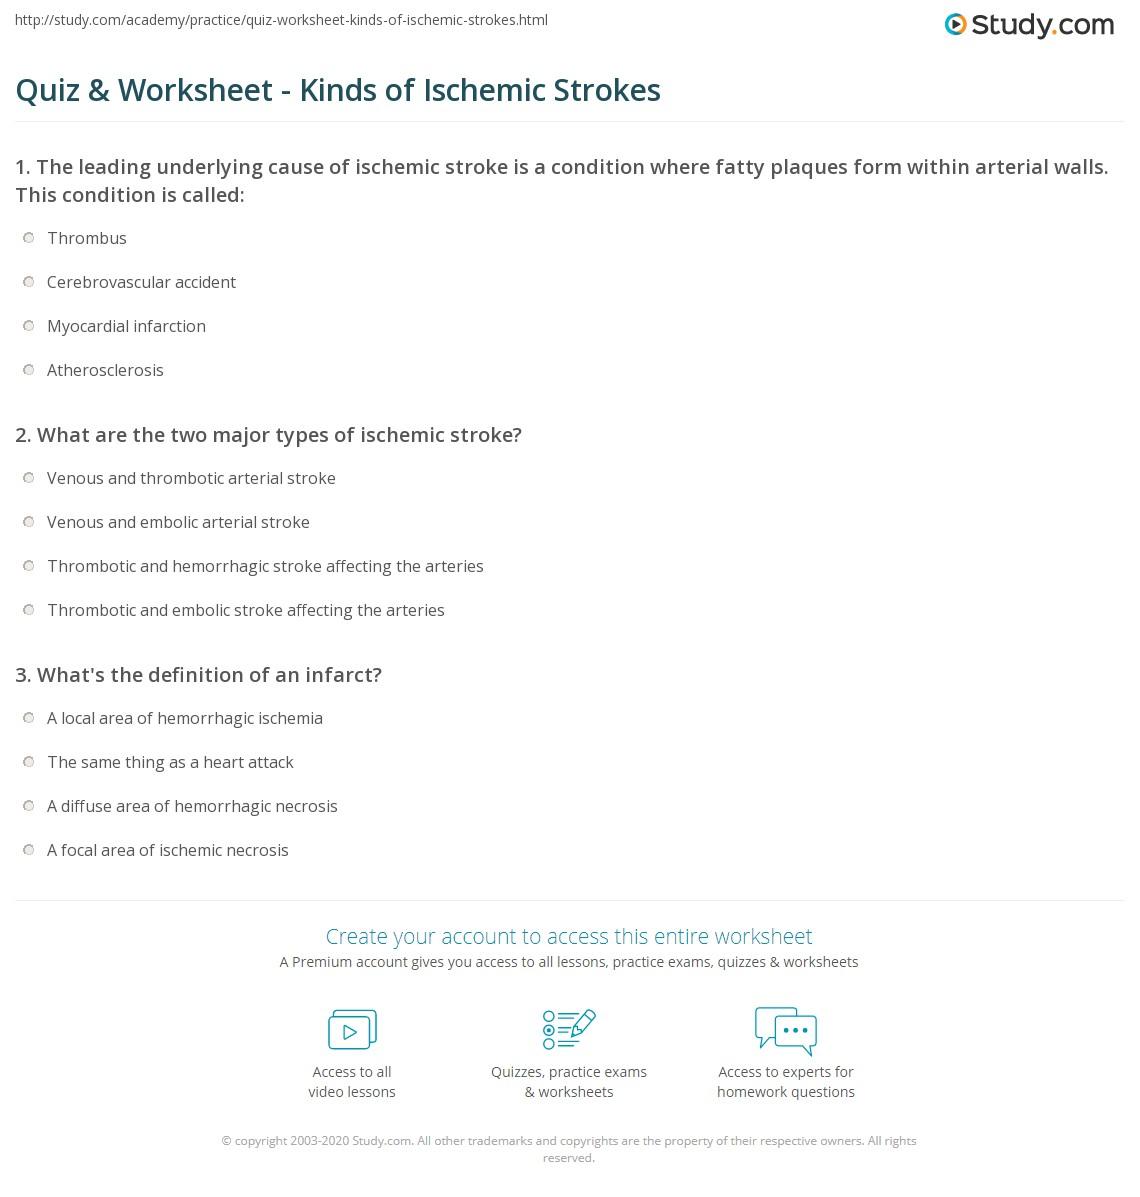 quiz & worksheet - kinds of ischemic strokes | study